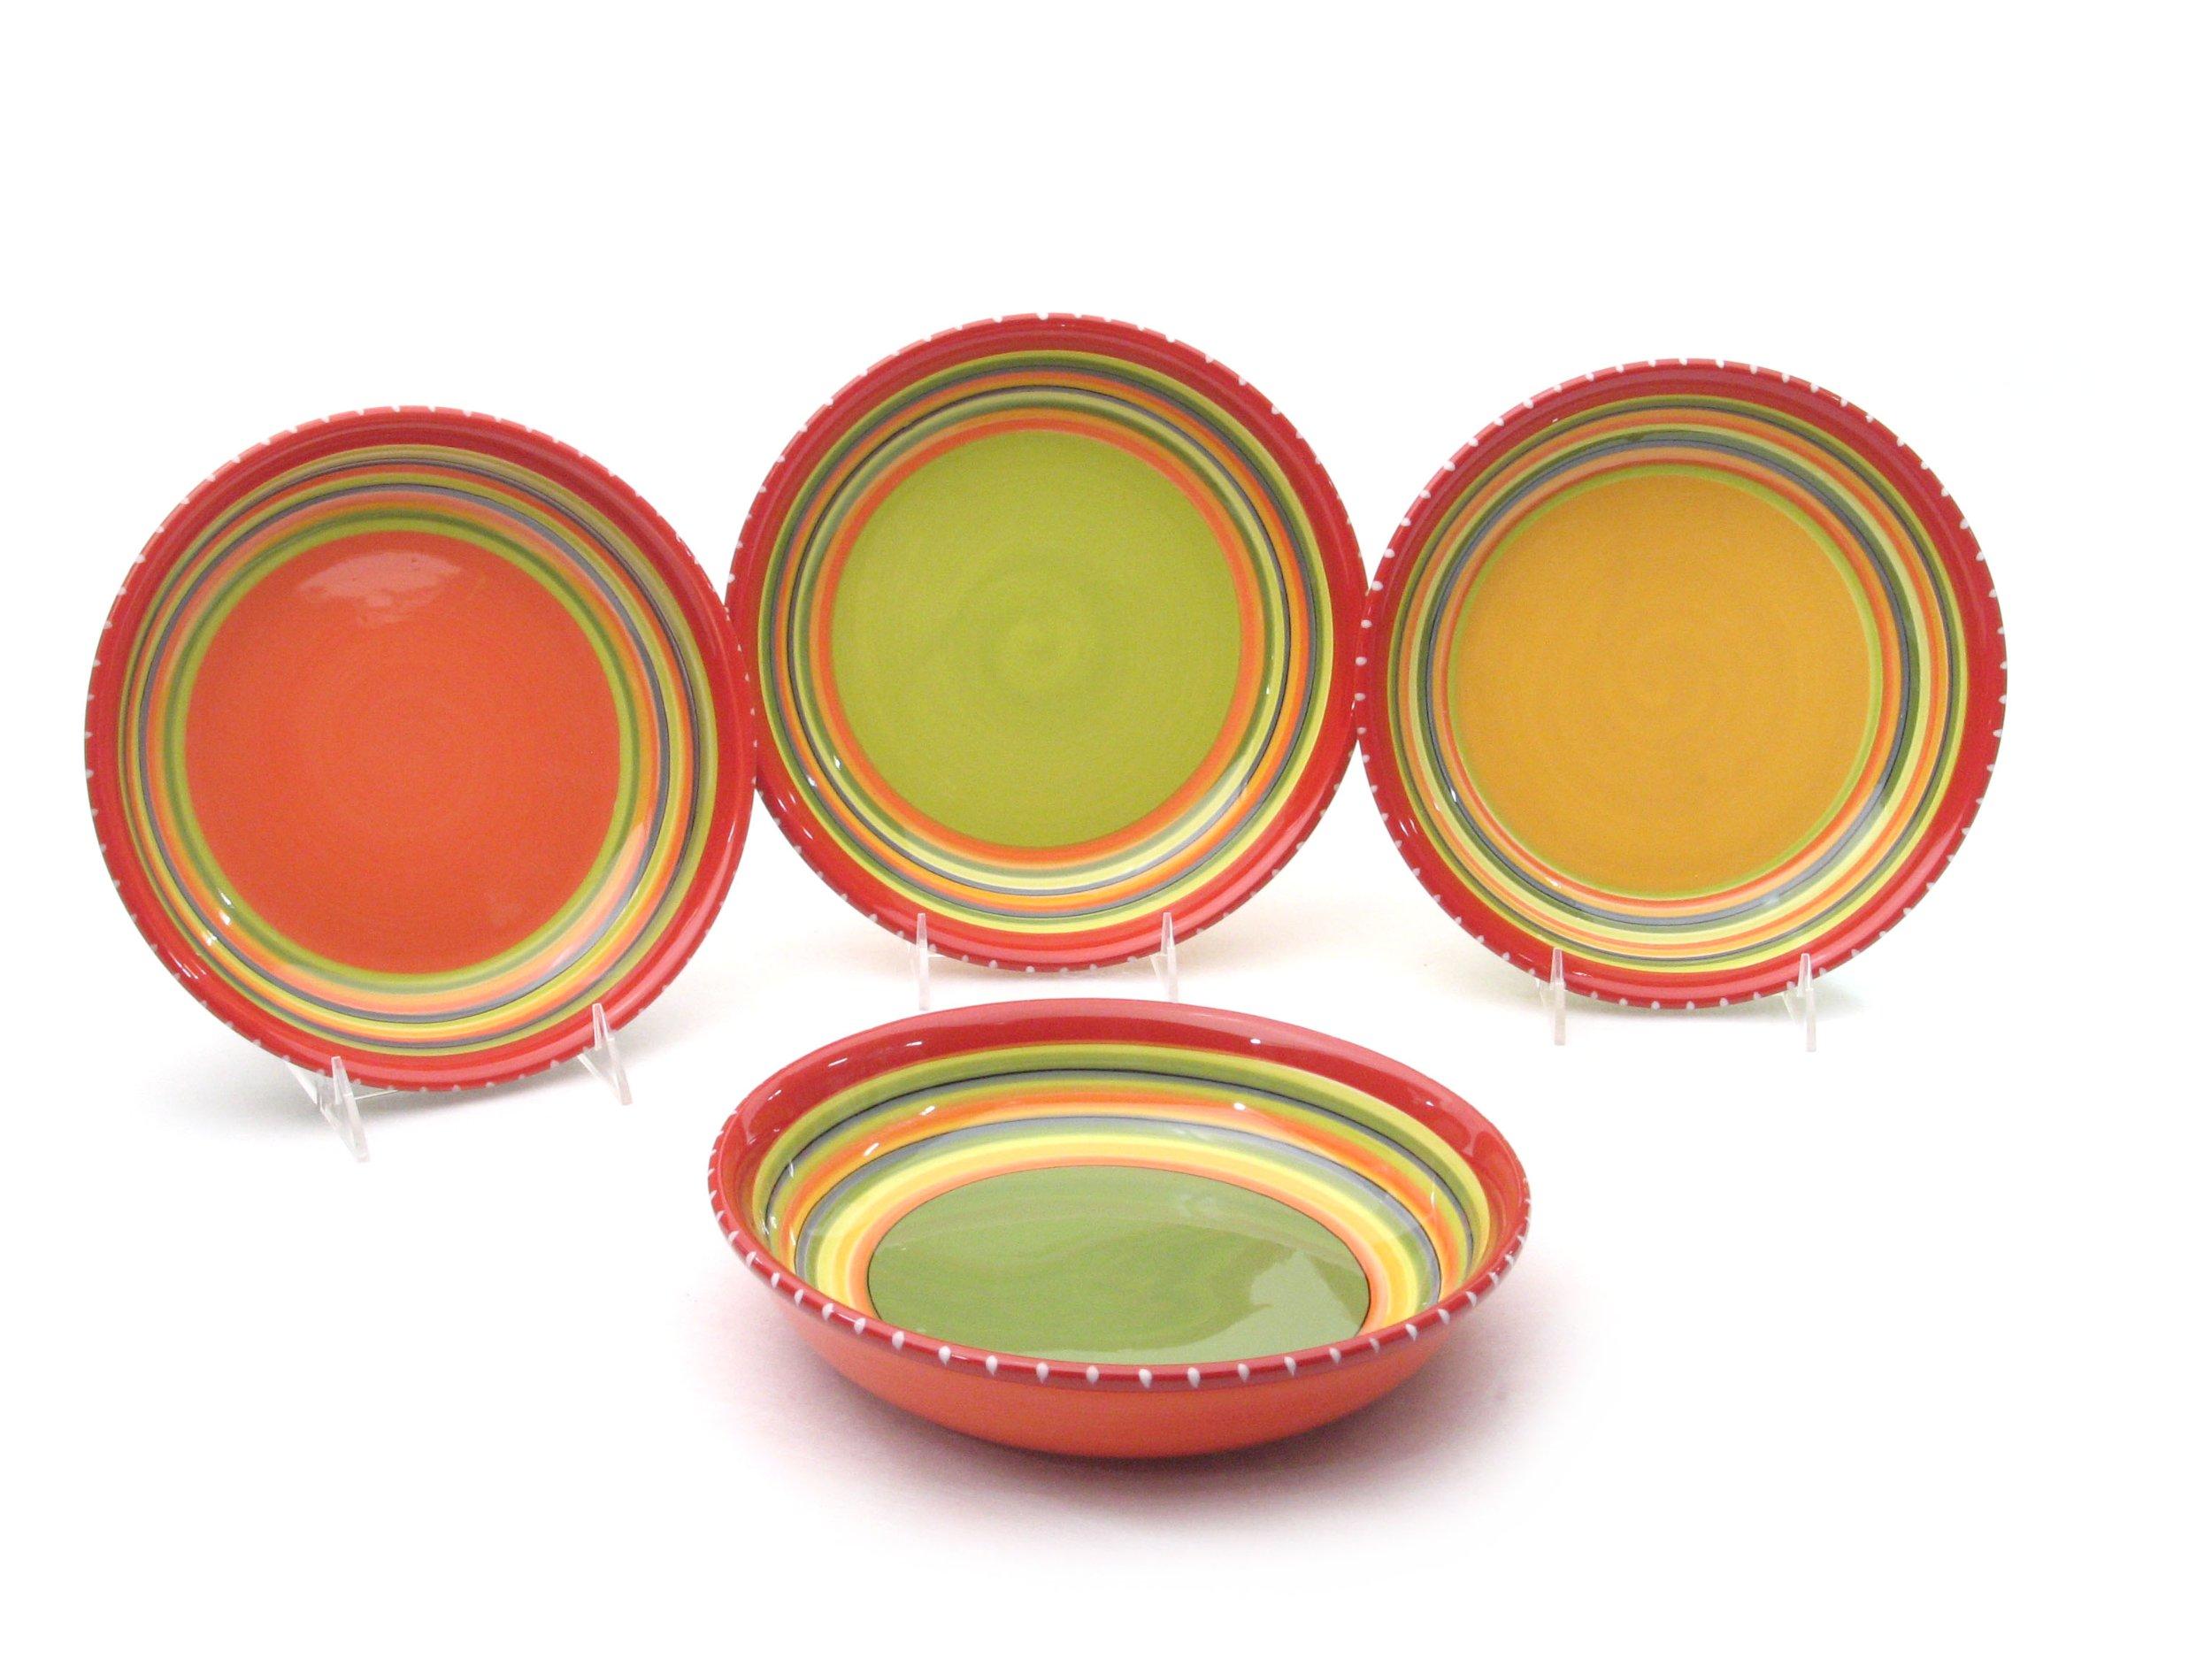 Certified International Hot Tamale Soup/Cereal Bowl, Set of 4 Assorted Designs